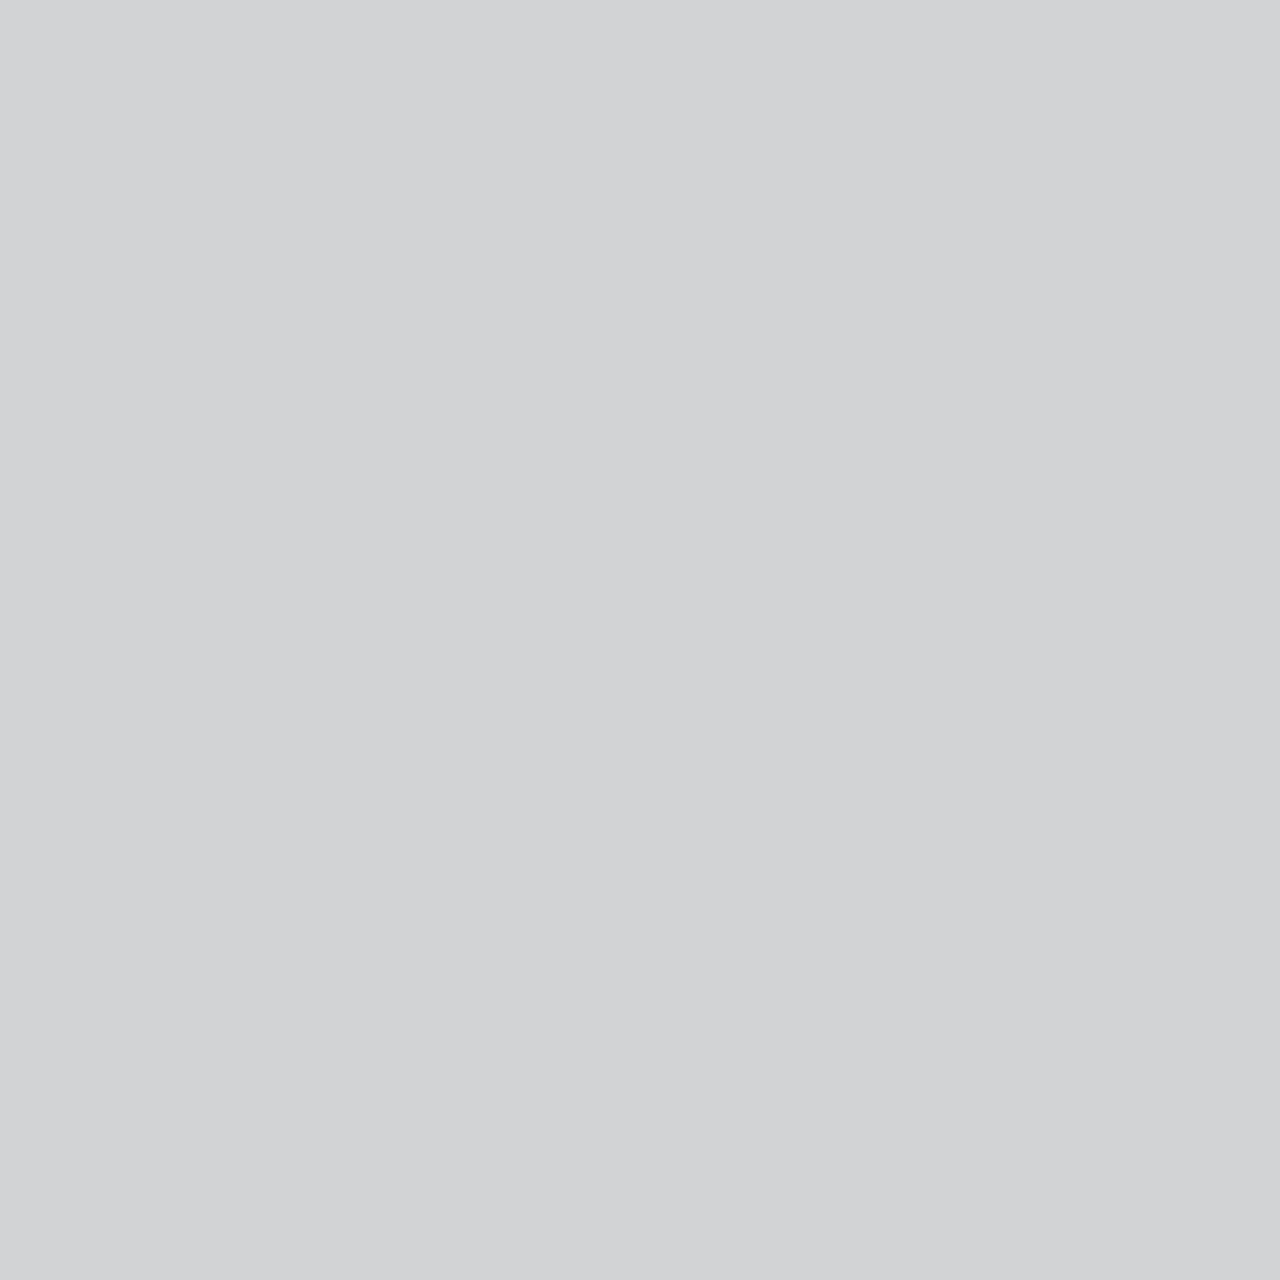 LEE FILTERS LEE100 SOLID NEUTRAL DENSITY FILTER (0.3)(1-STOP)